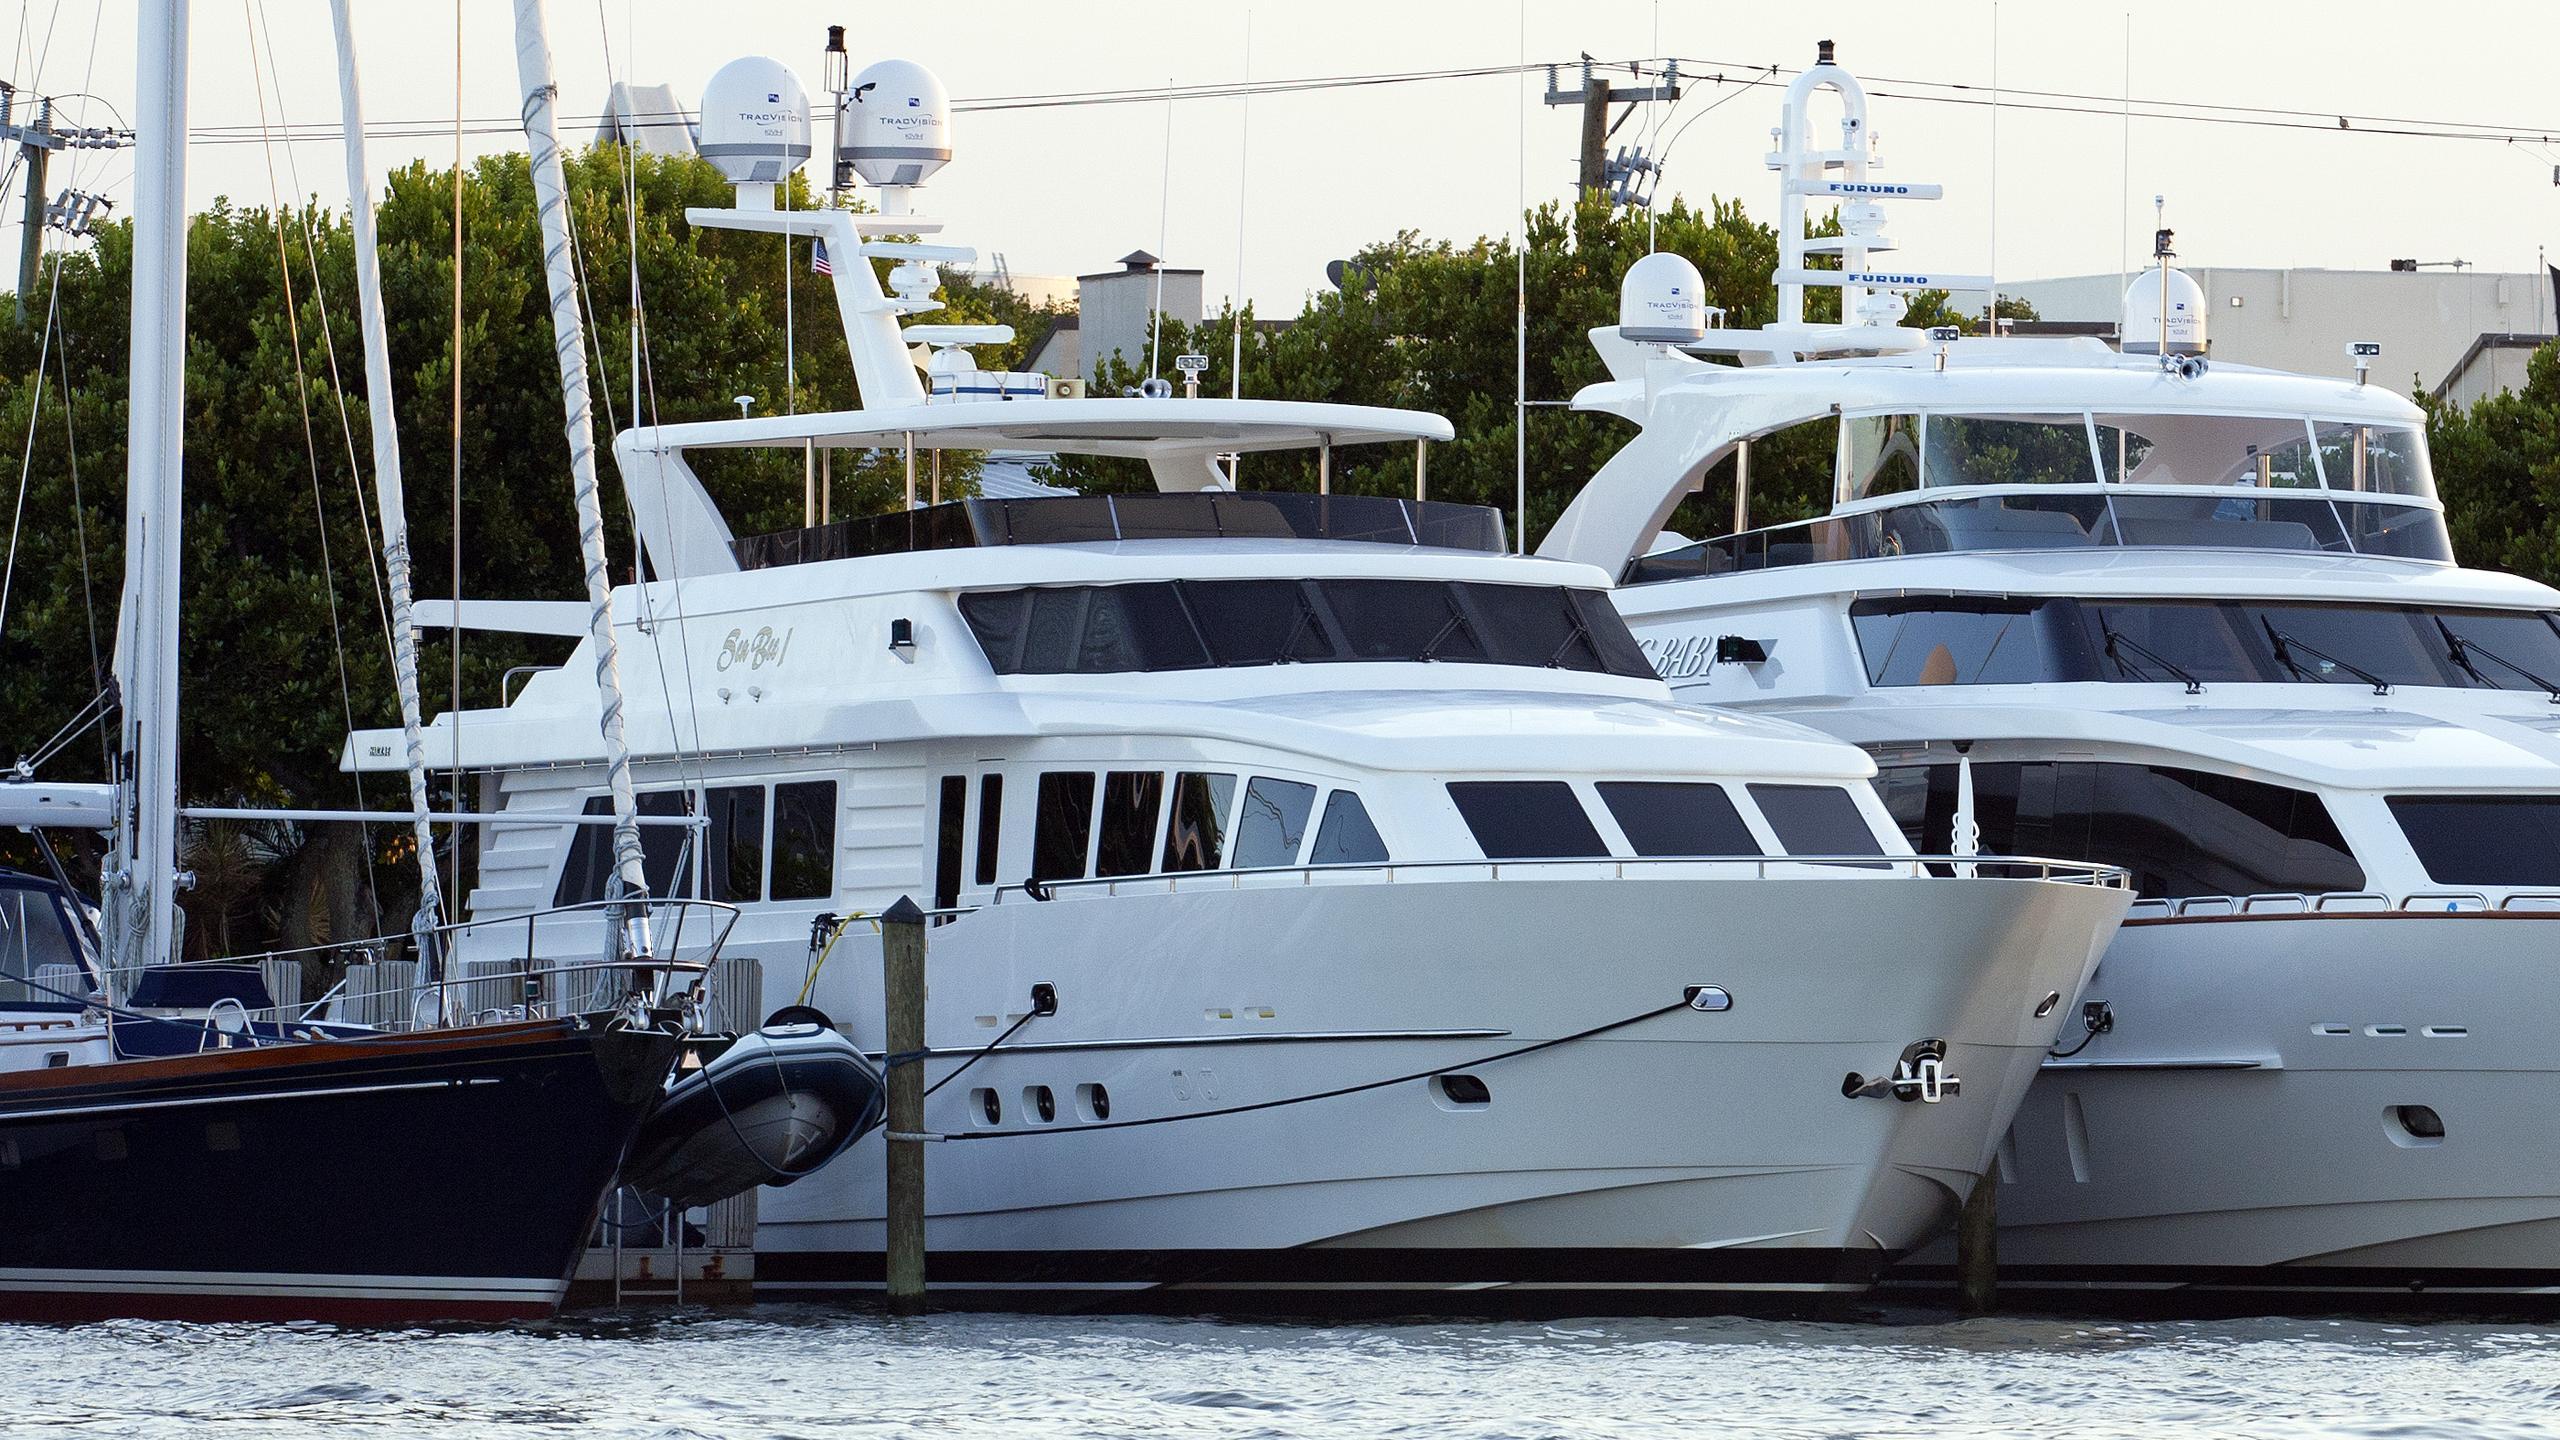 jessconn-sea-bee-i-motor-yacht-hargrave-97-rph-2005-29m-berth